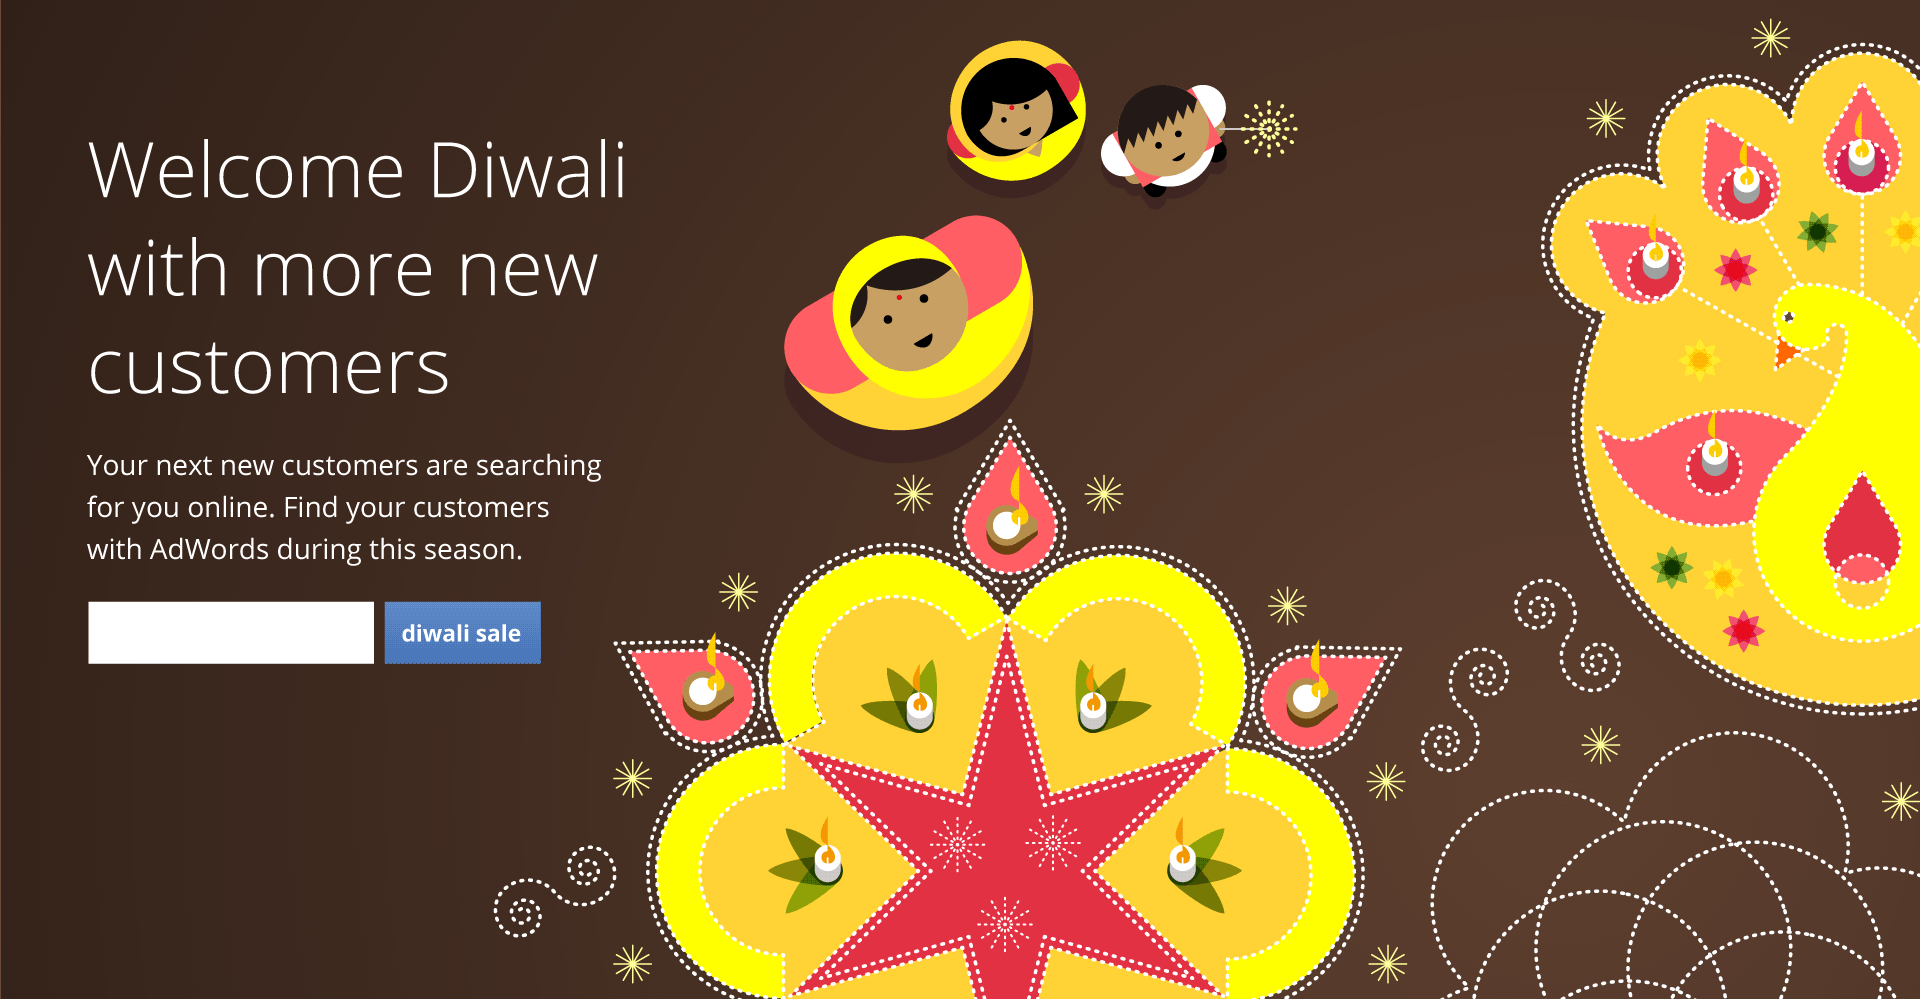 Google Adwords Diwali Illustrations